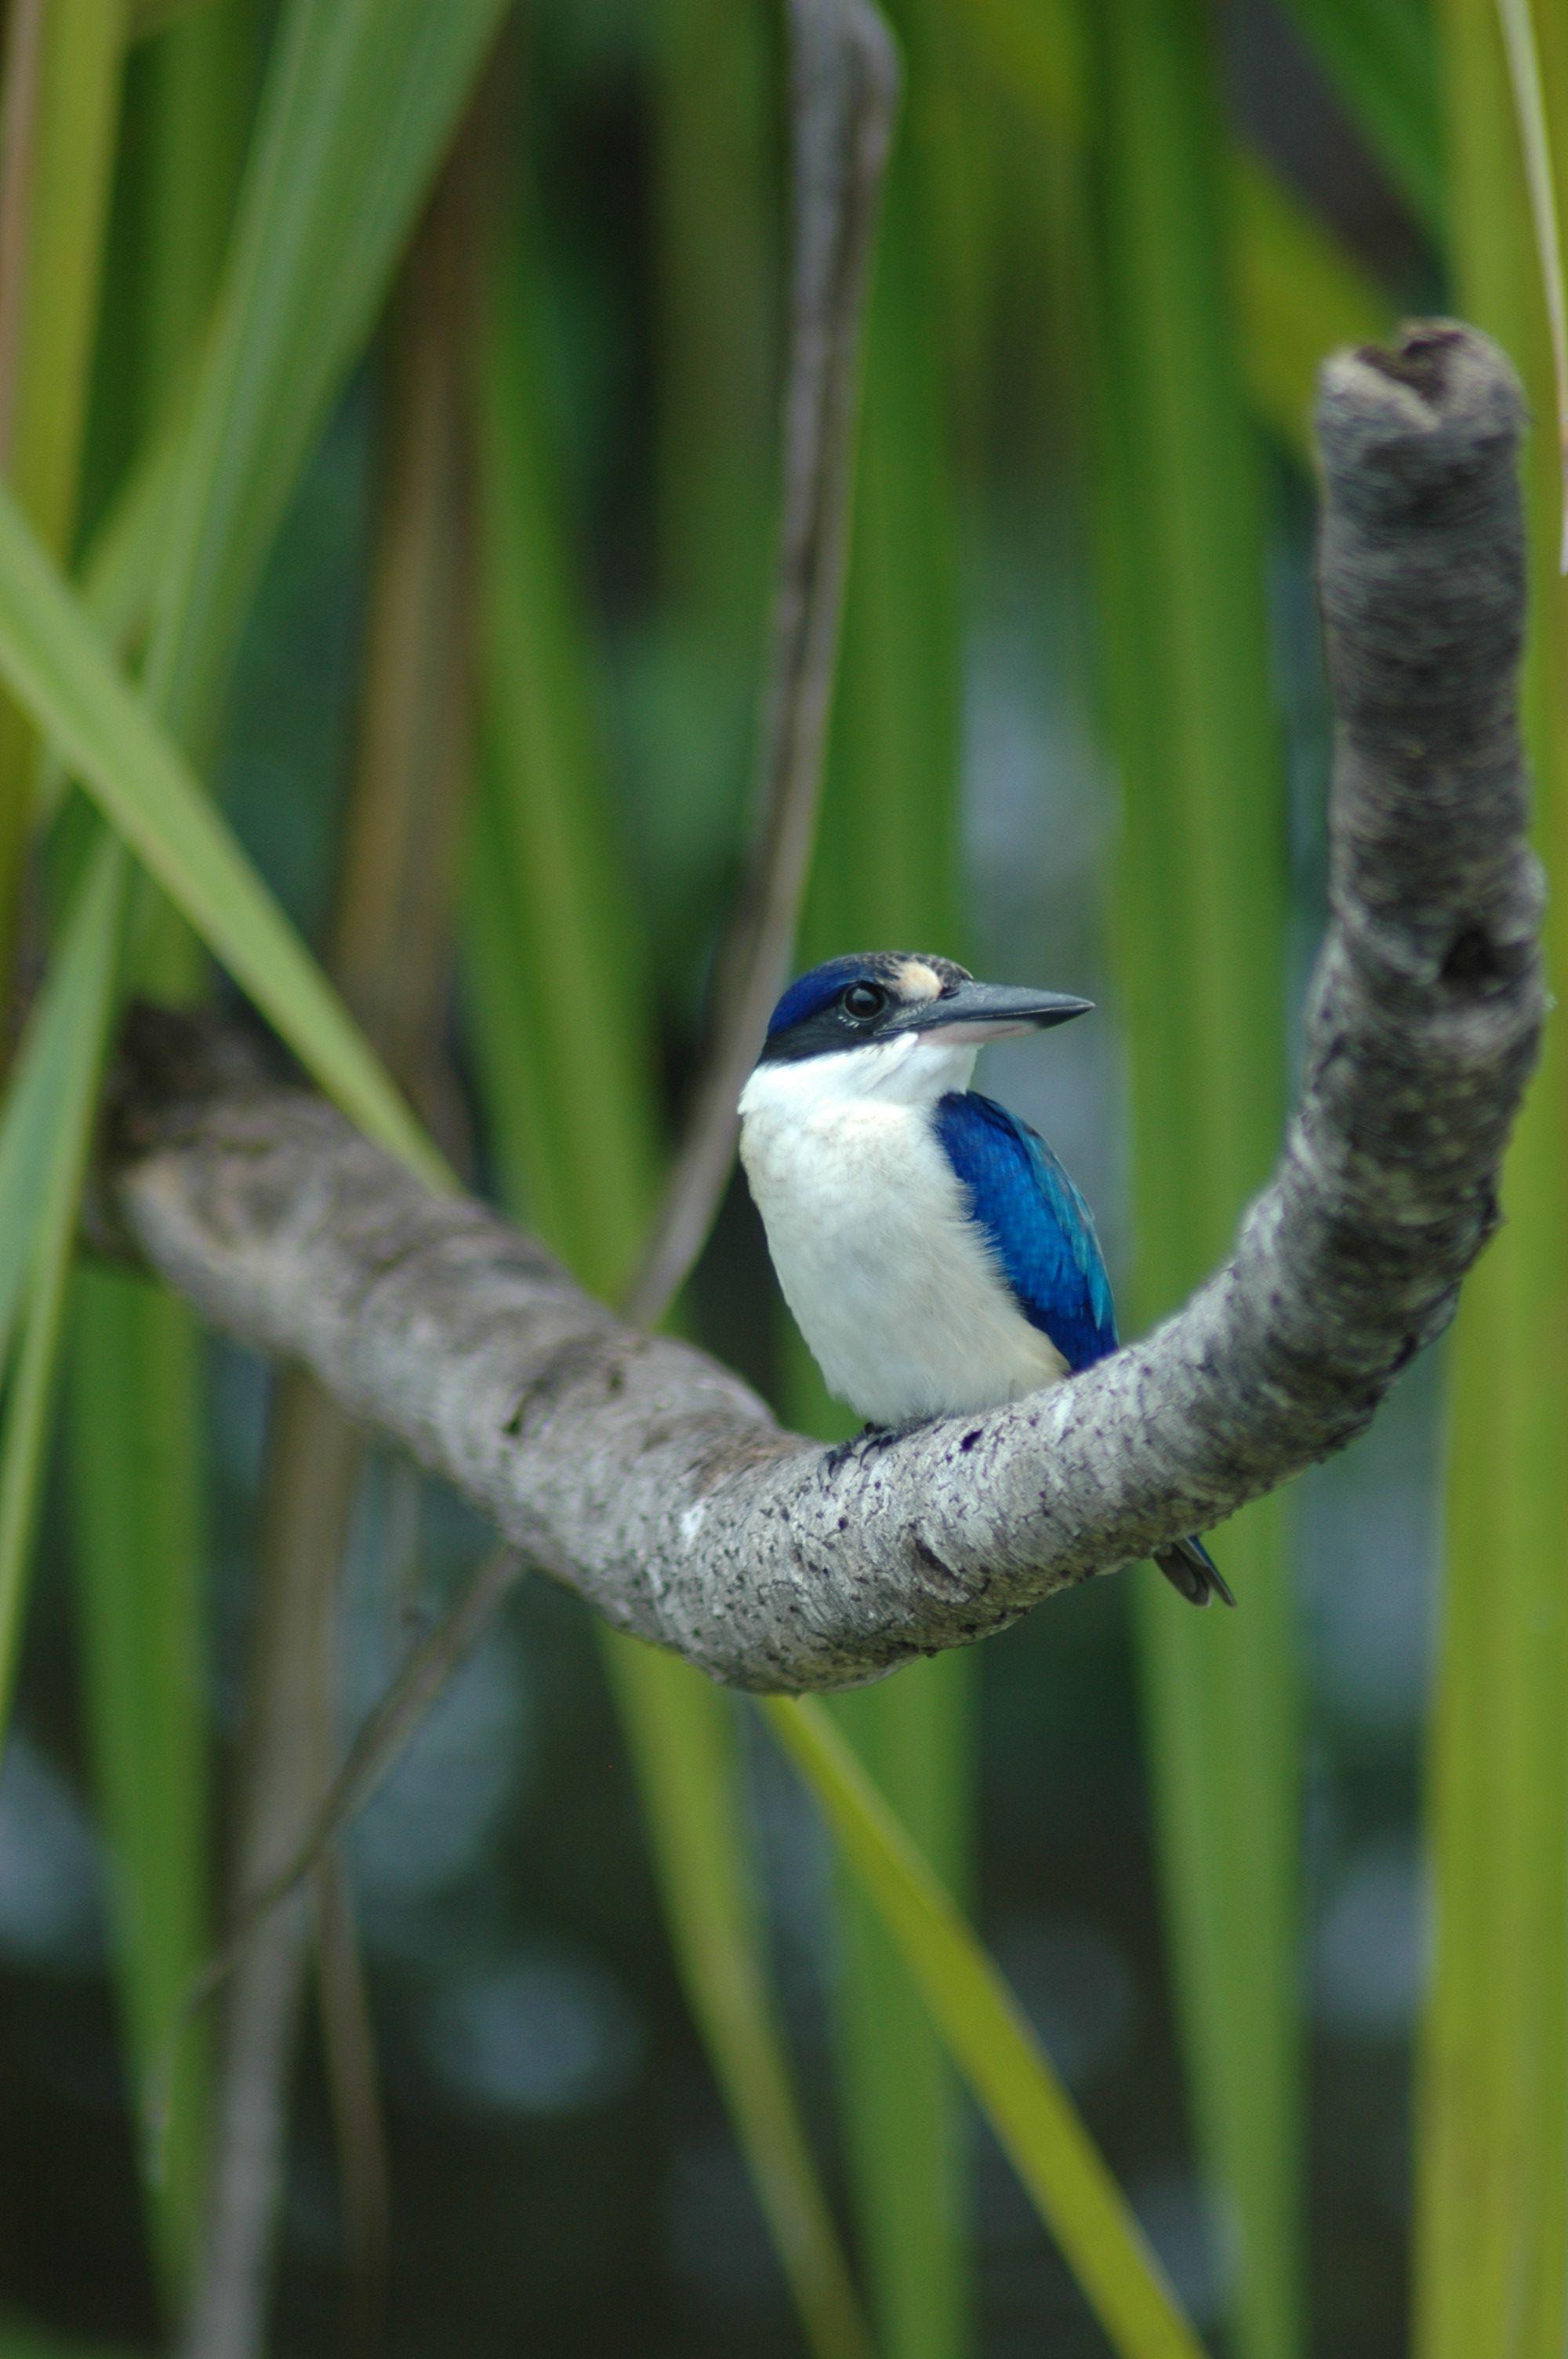 kingfisher at kakadu national park northern territory australia